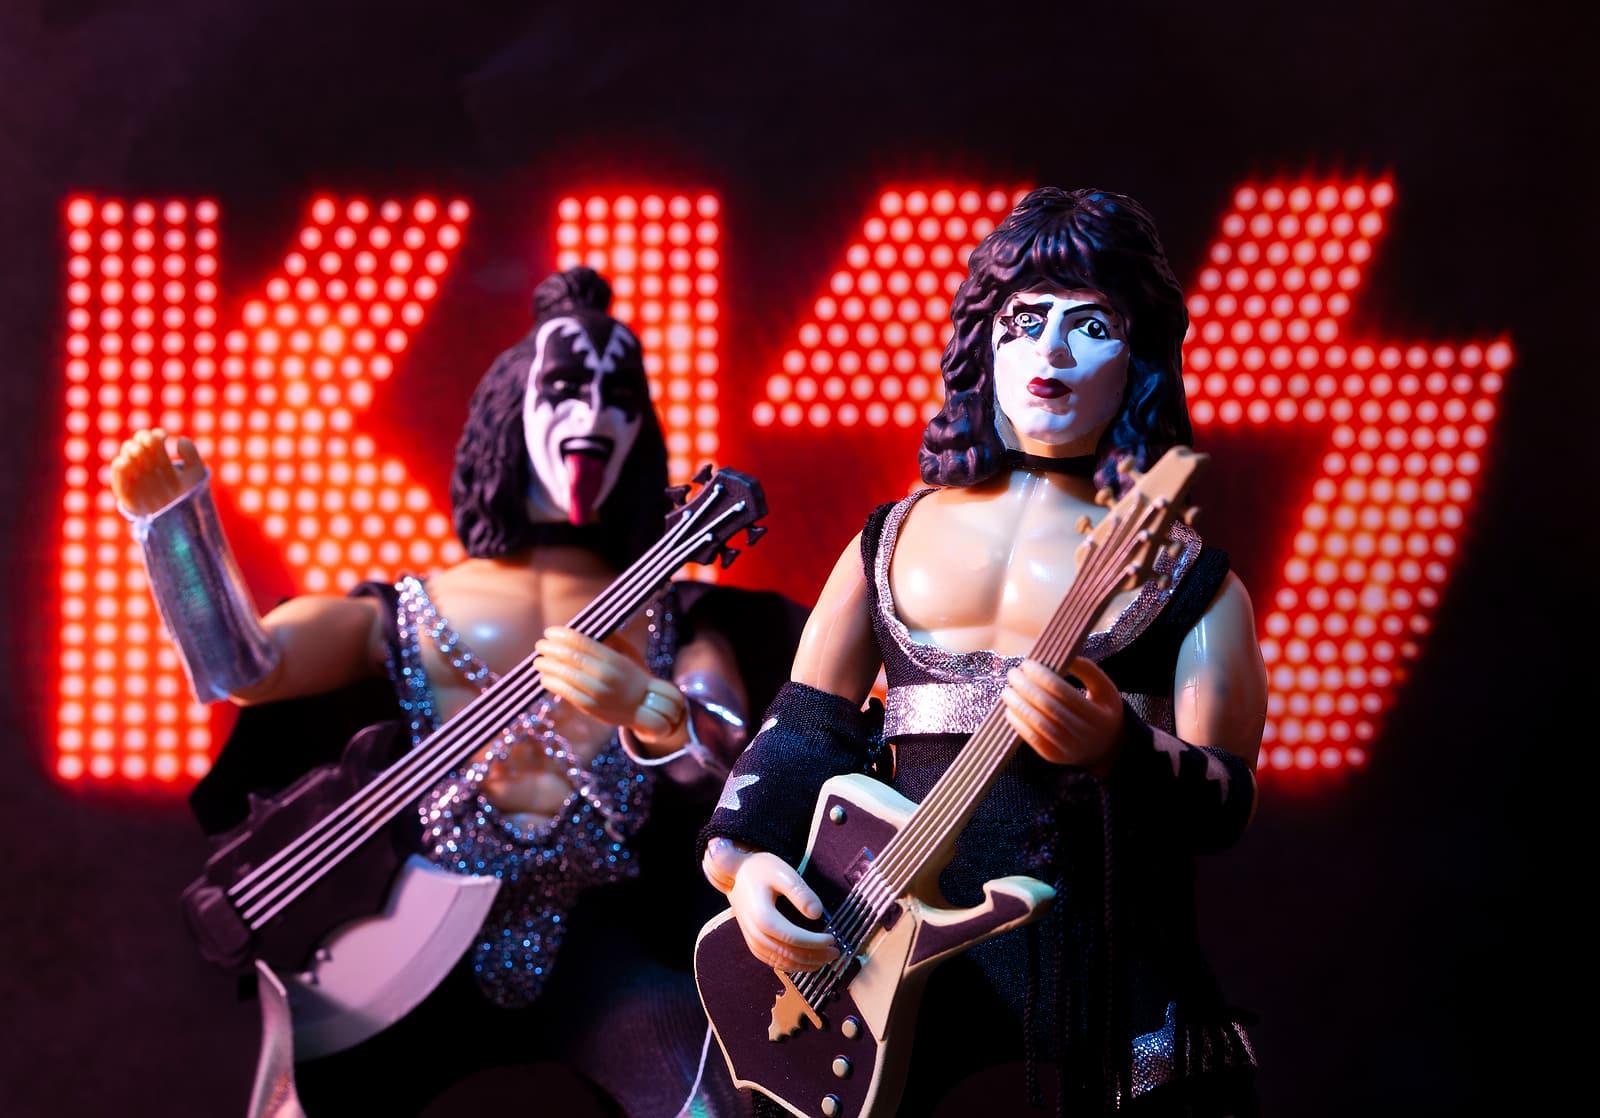 David Lee Roth says KISS Off to Gene Simmons